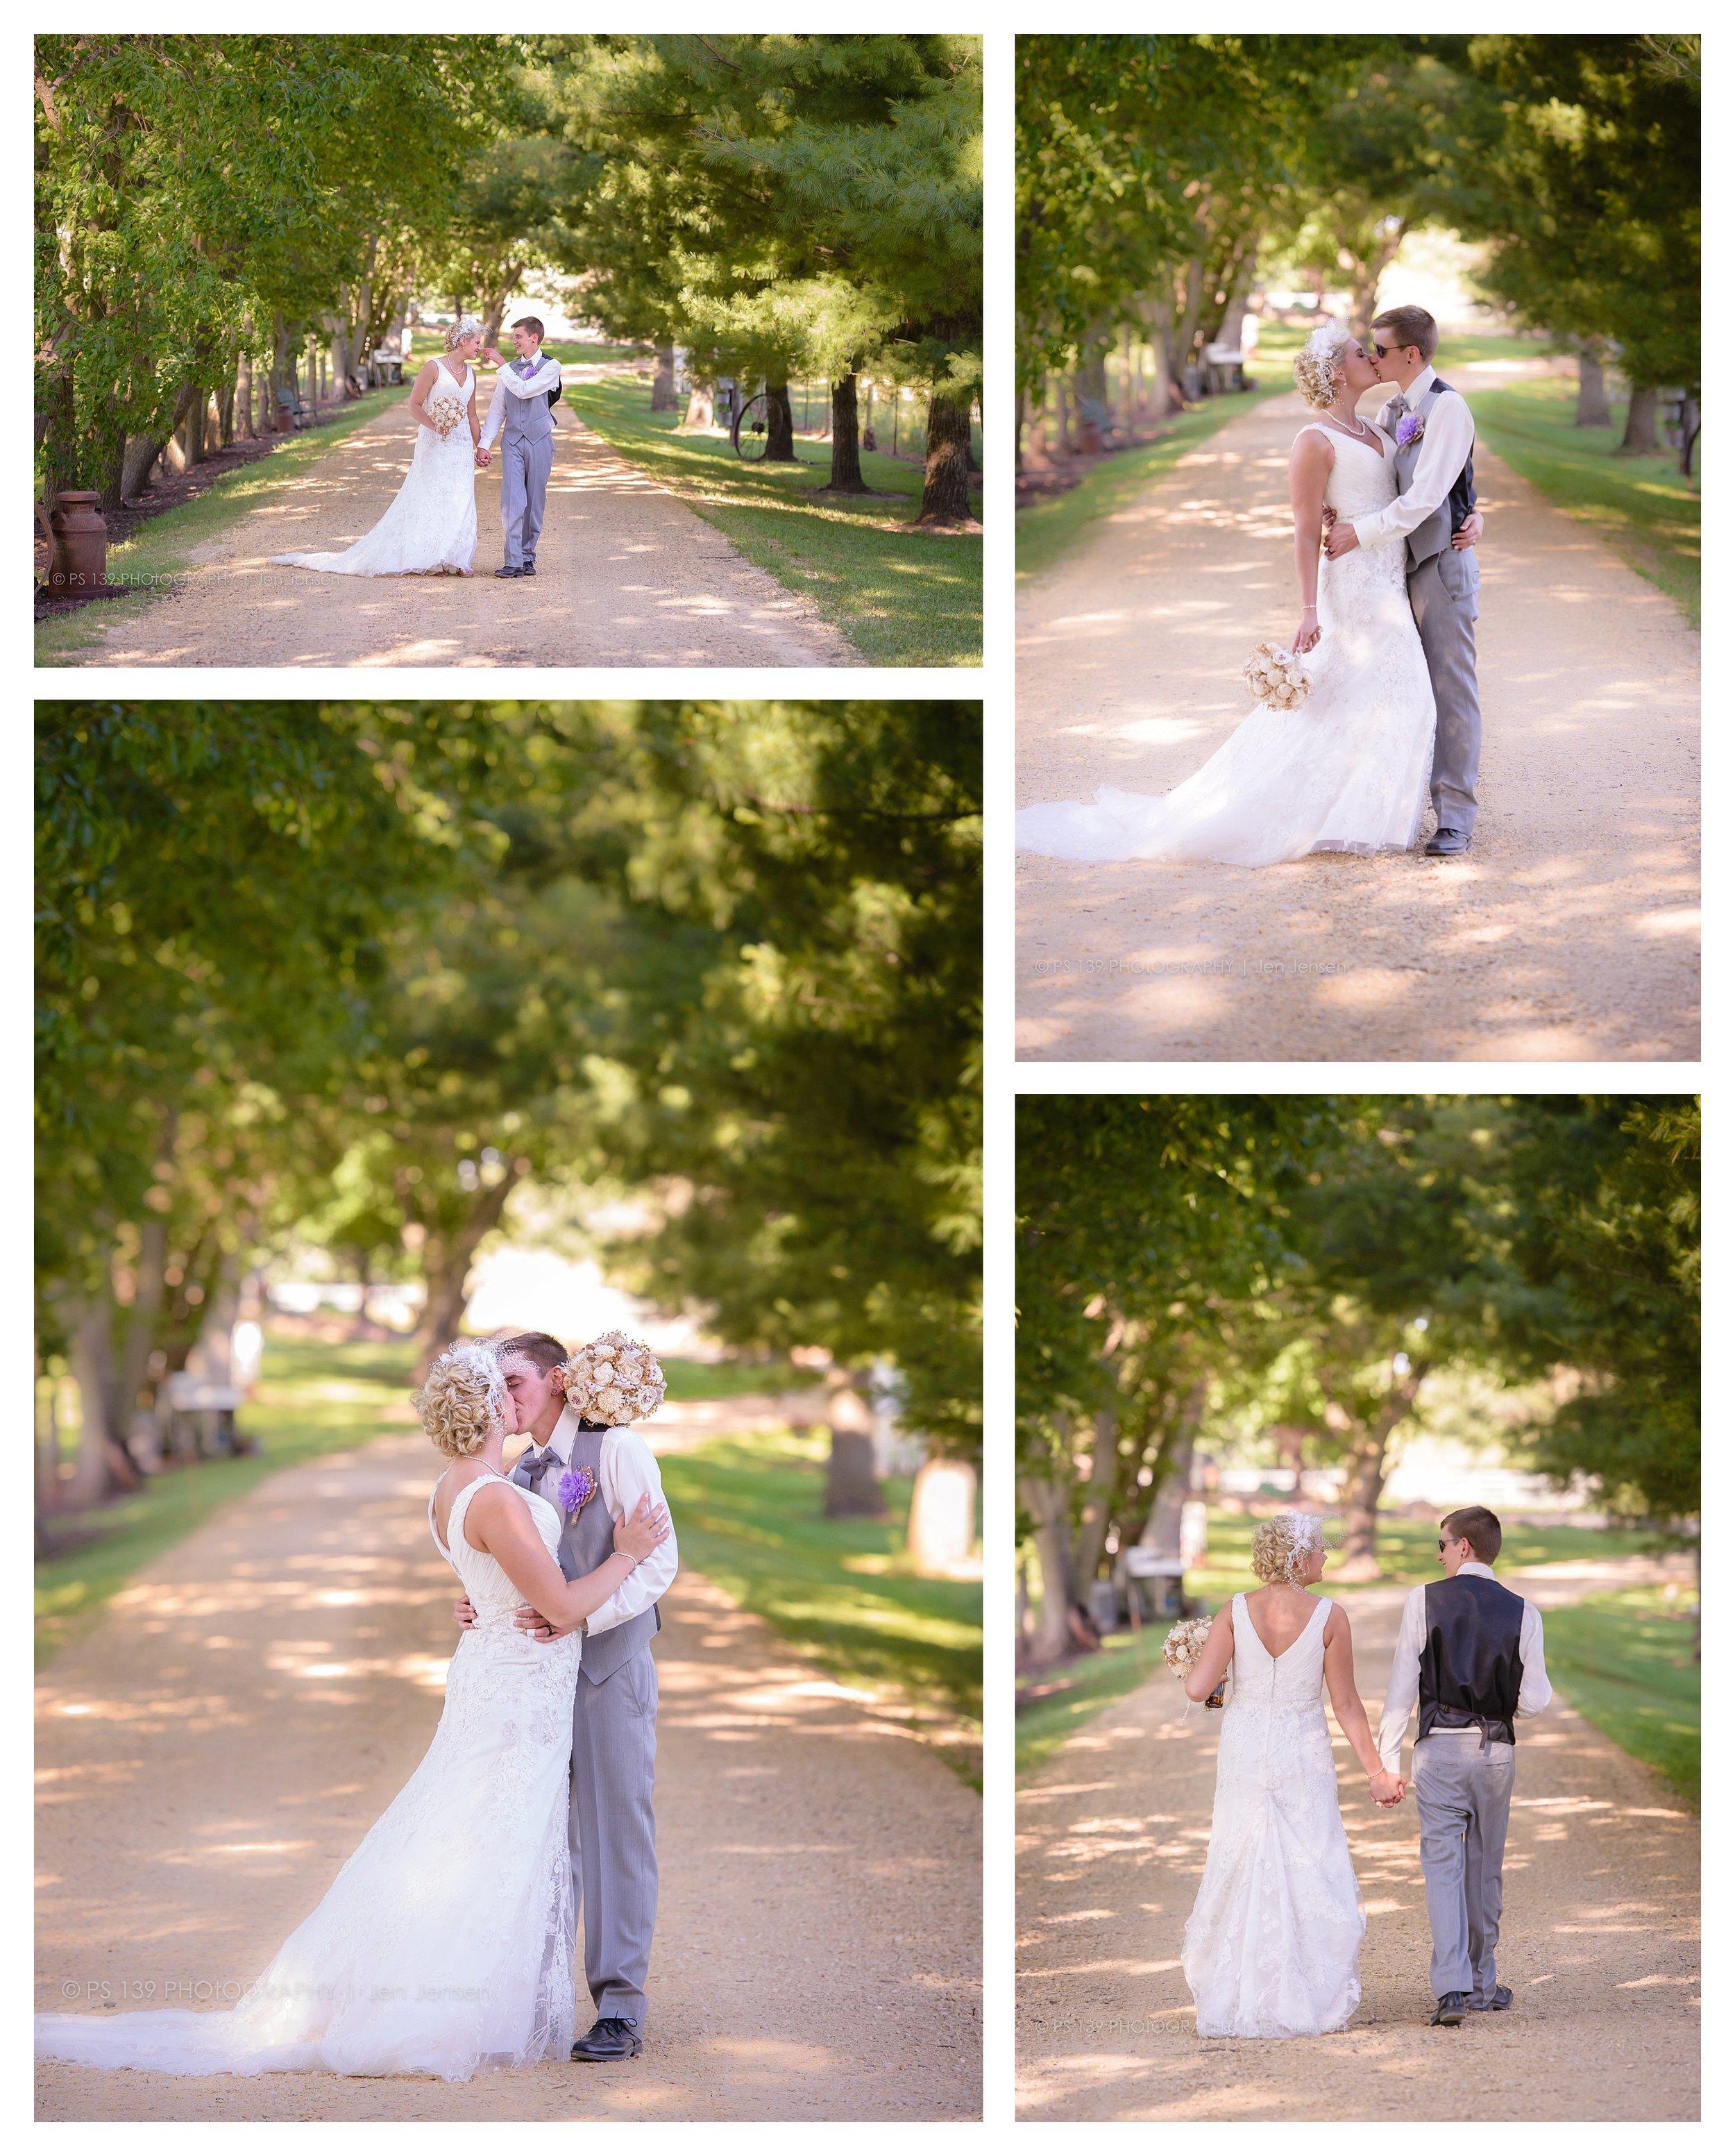 oregon Illinois oak lane farm wisconsin wedding photographer bayfield wi ps 139 photography jen jensen_0232.jpg